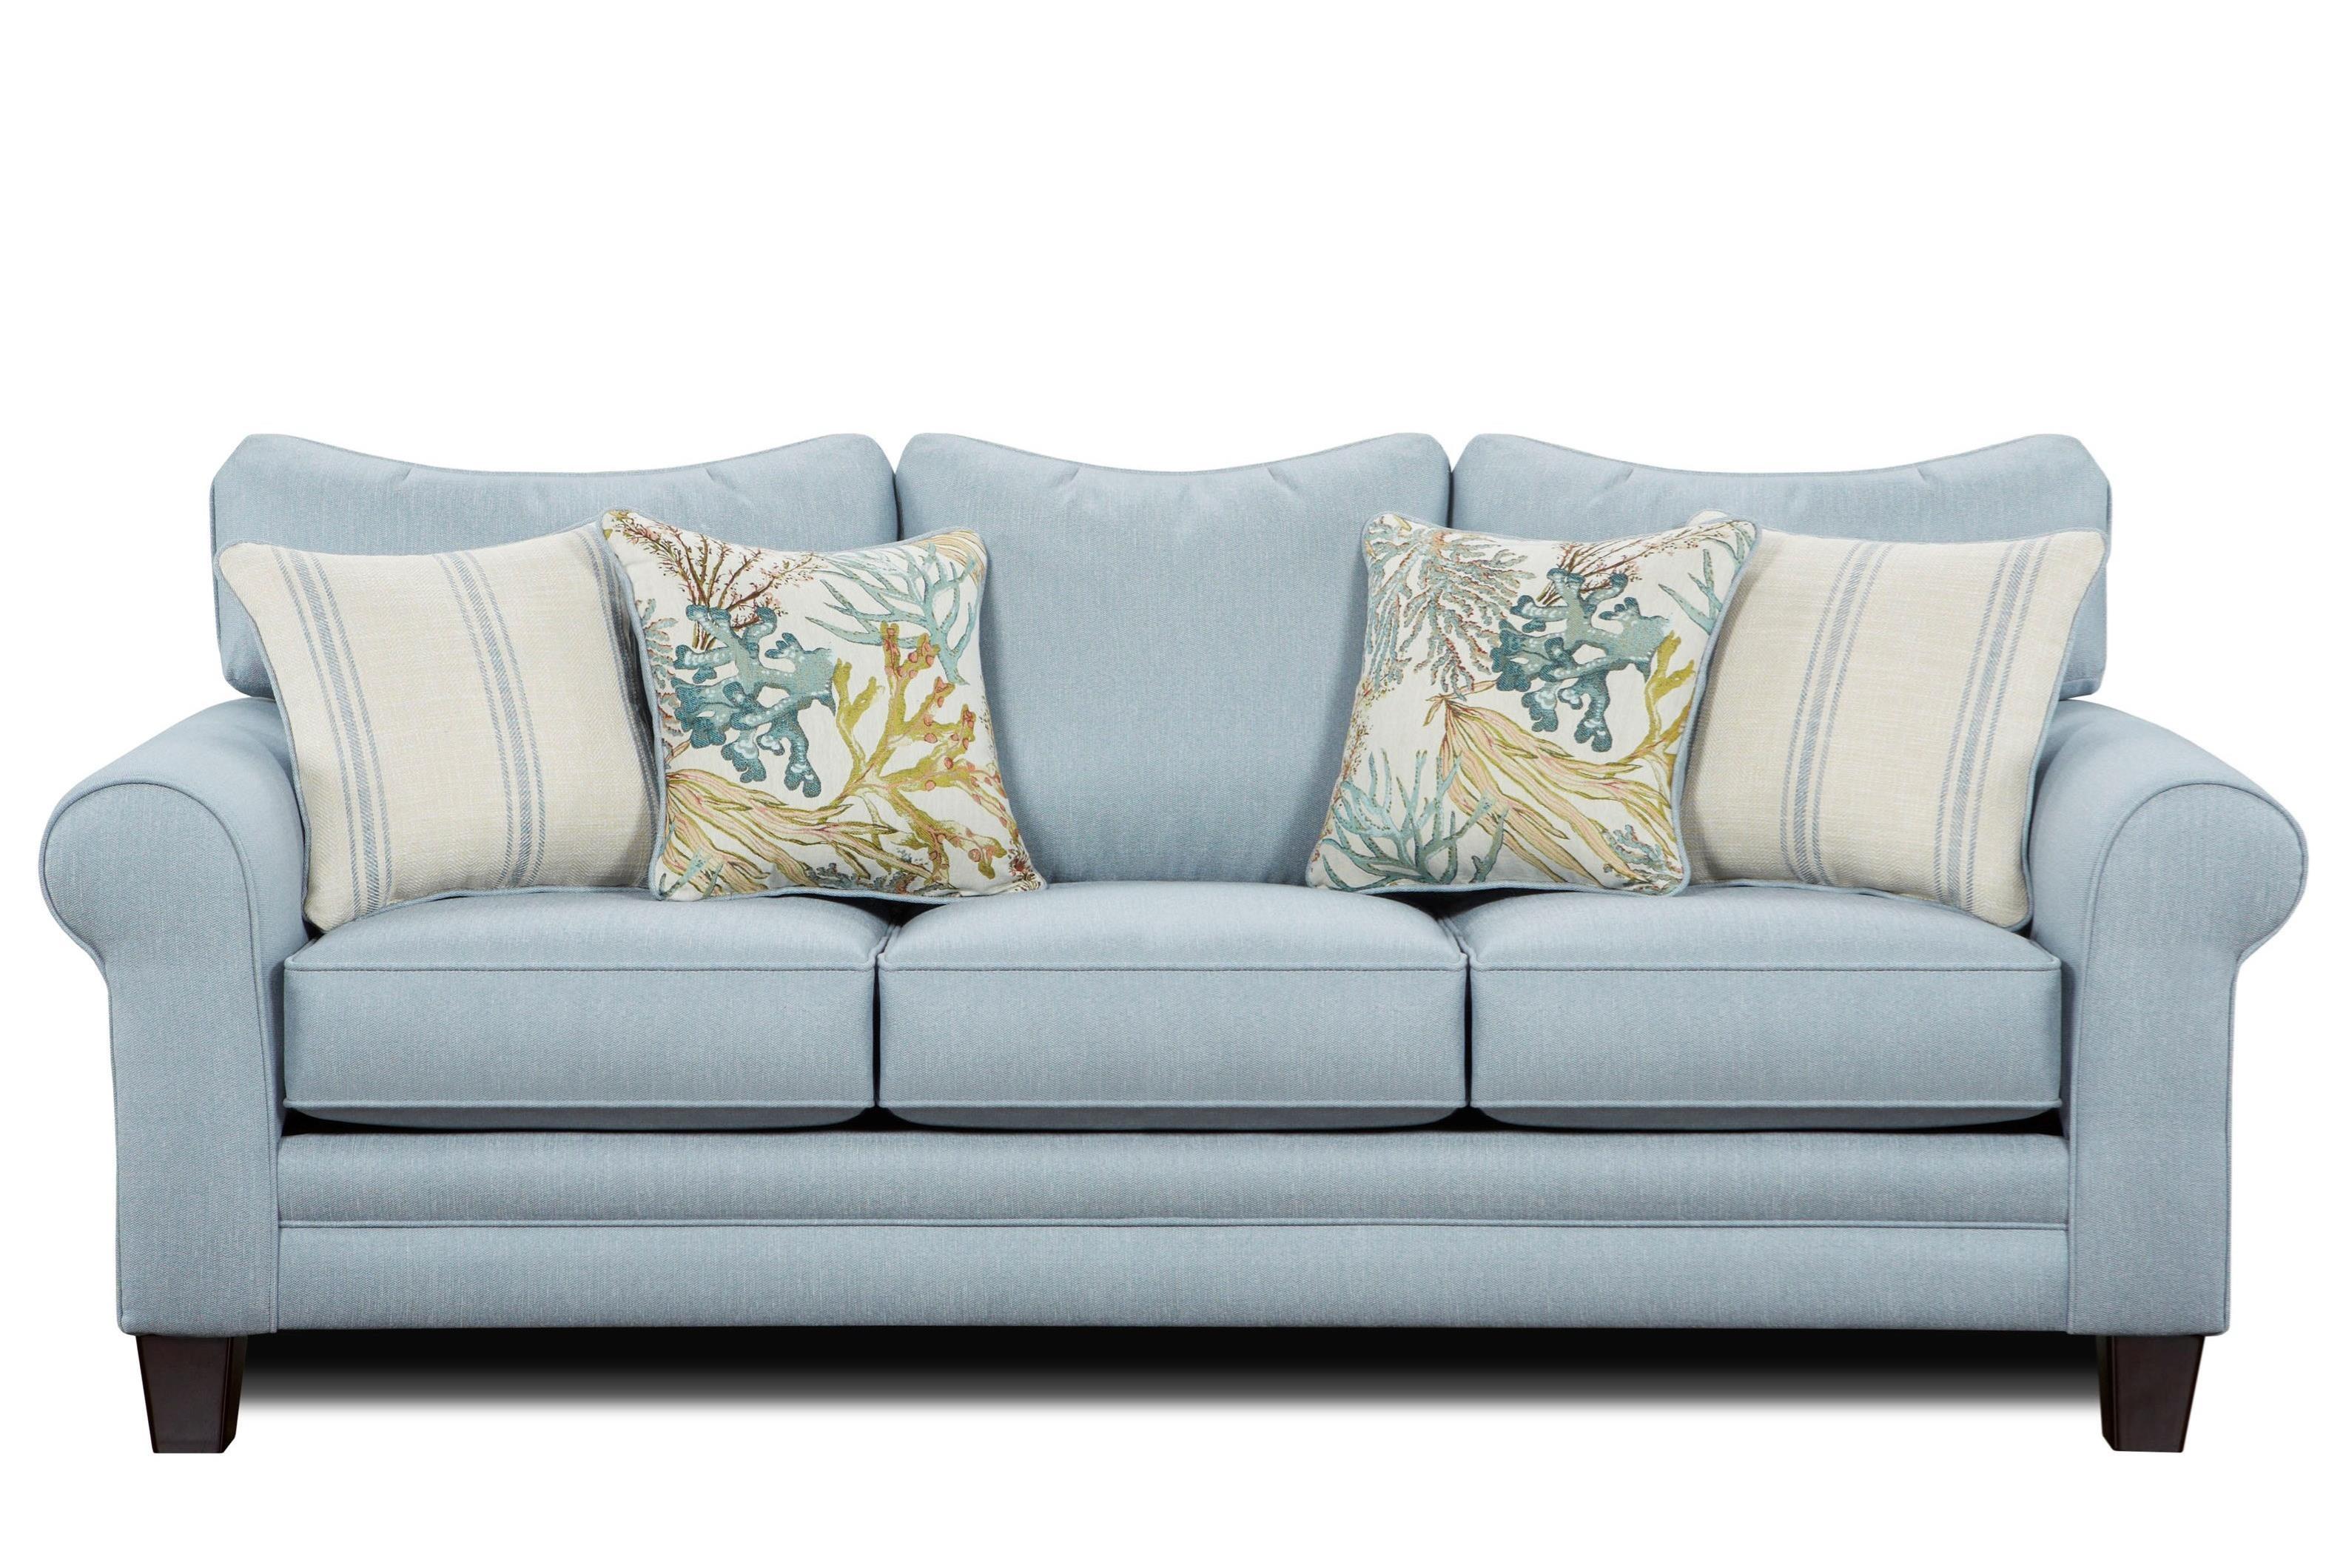 1140 Sleeper Sofa by Kent Home Furnishings at Johnny Janosik